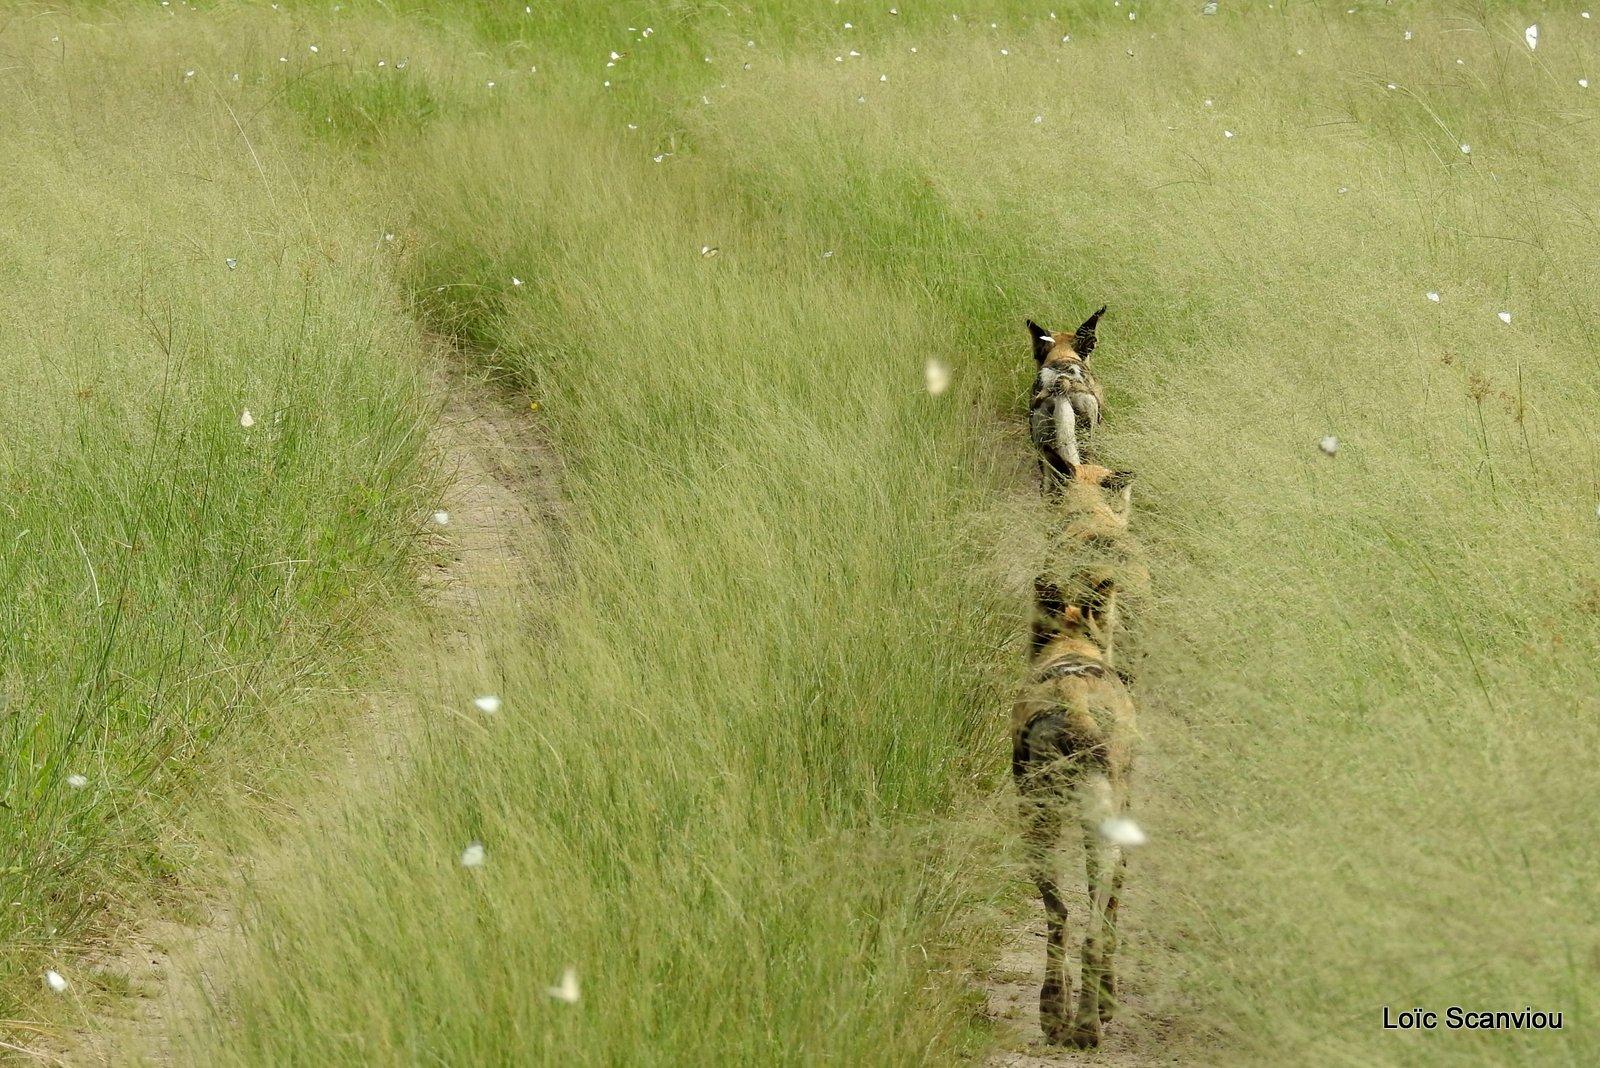 Lycaon/African Wild Dog (18)